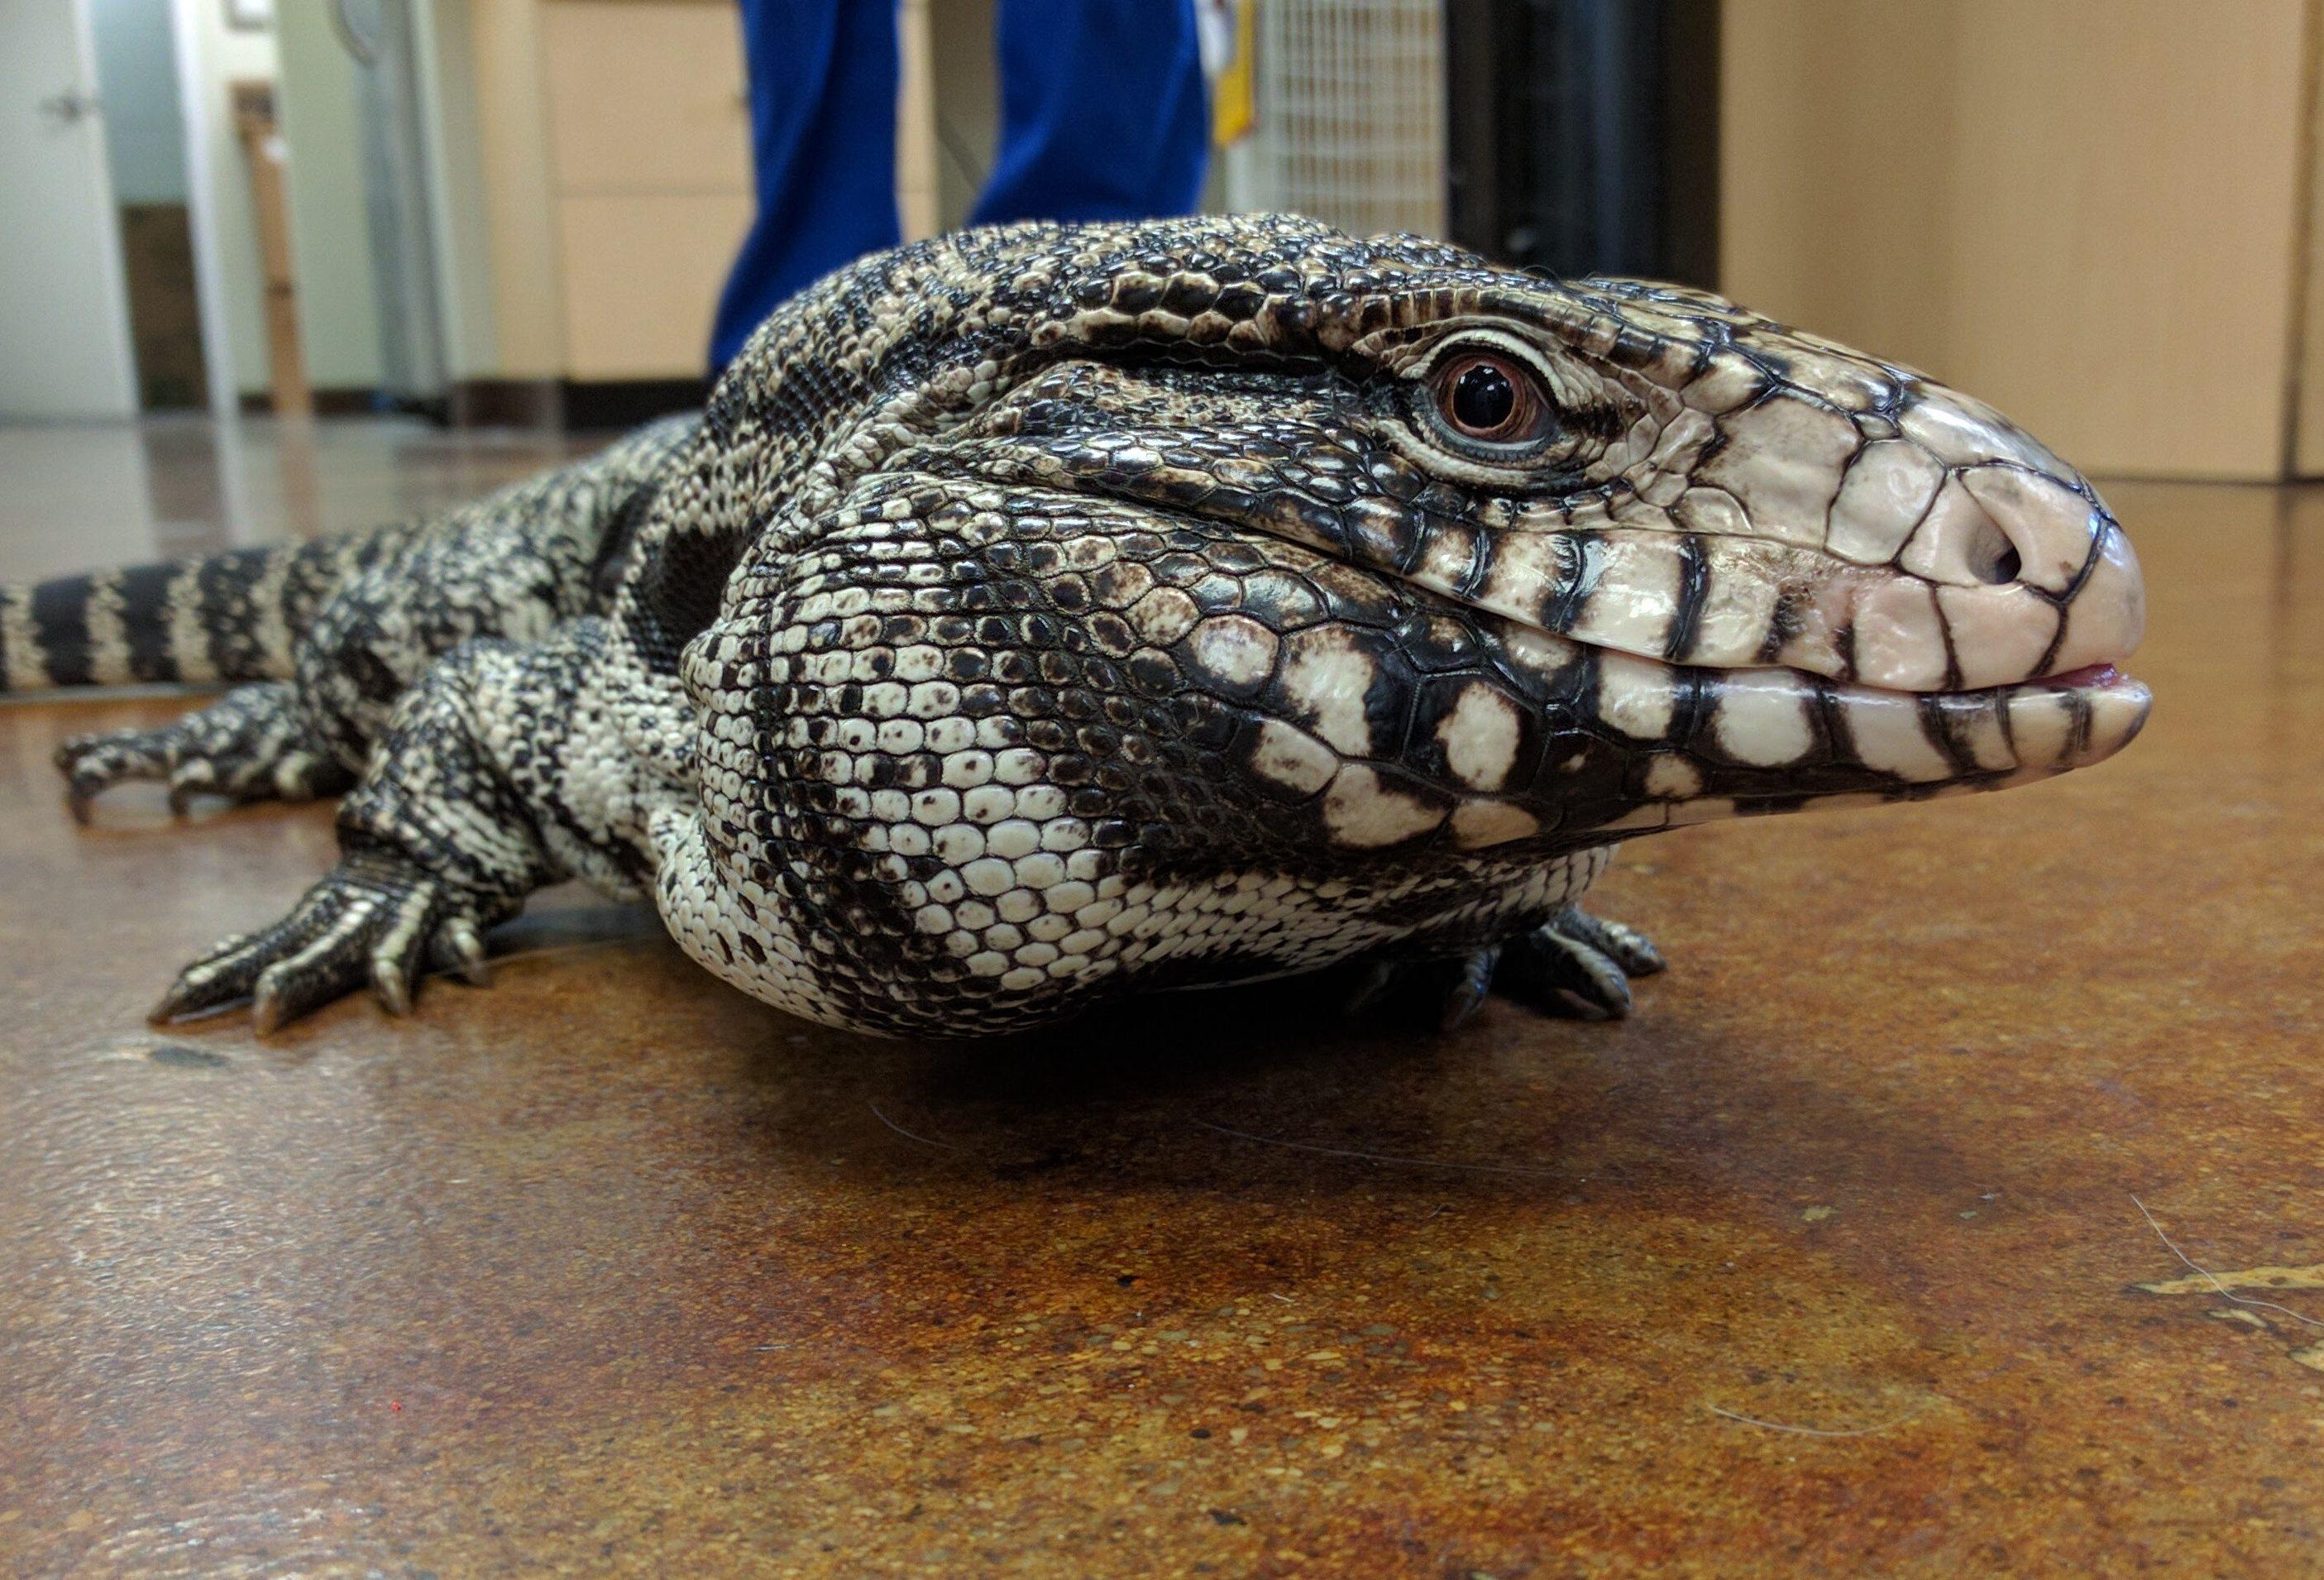 tegu husbandry and preventative healthcare stahl exotic animal